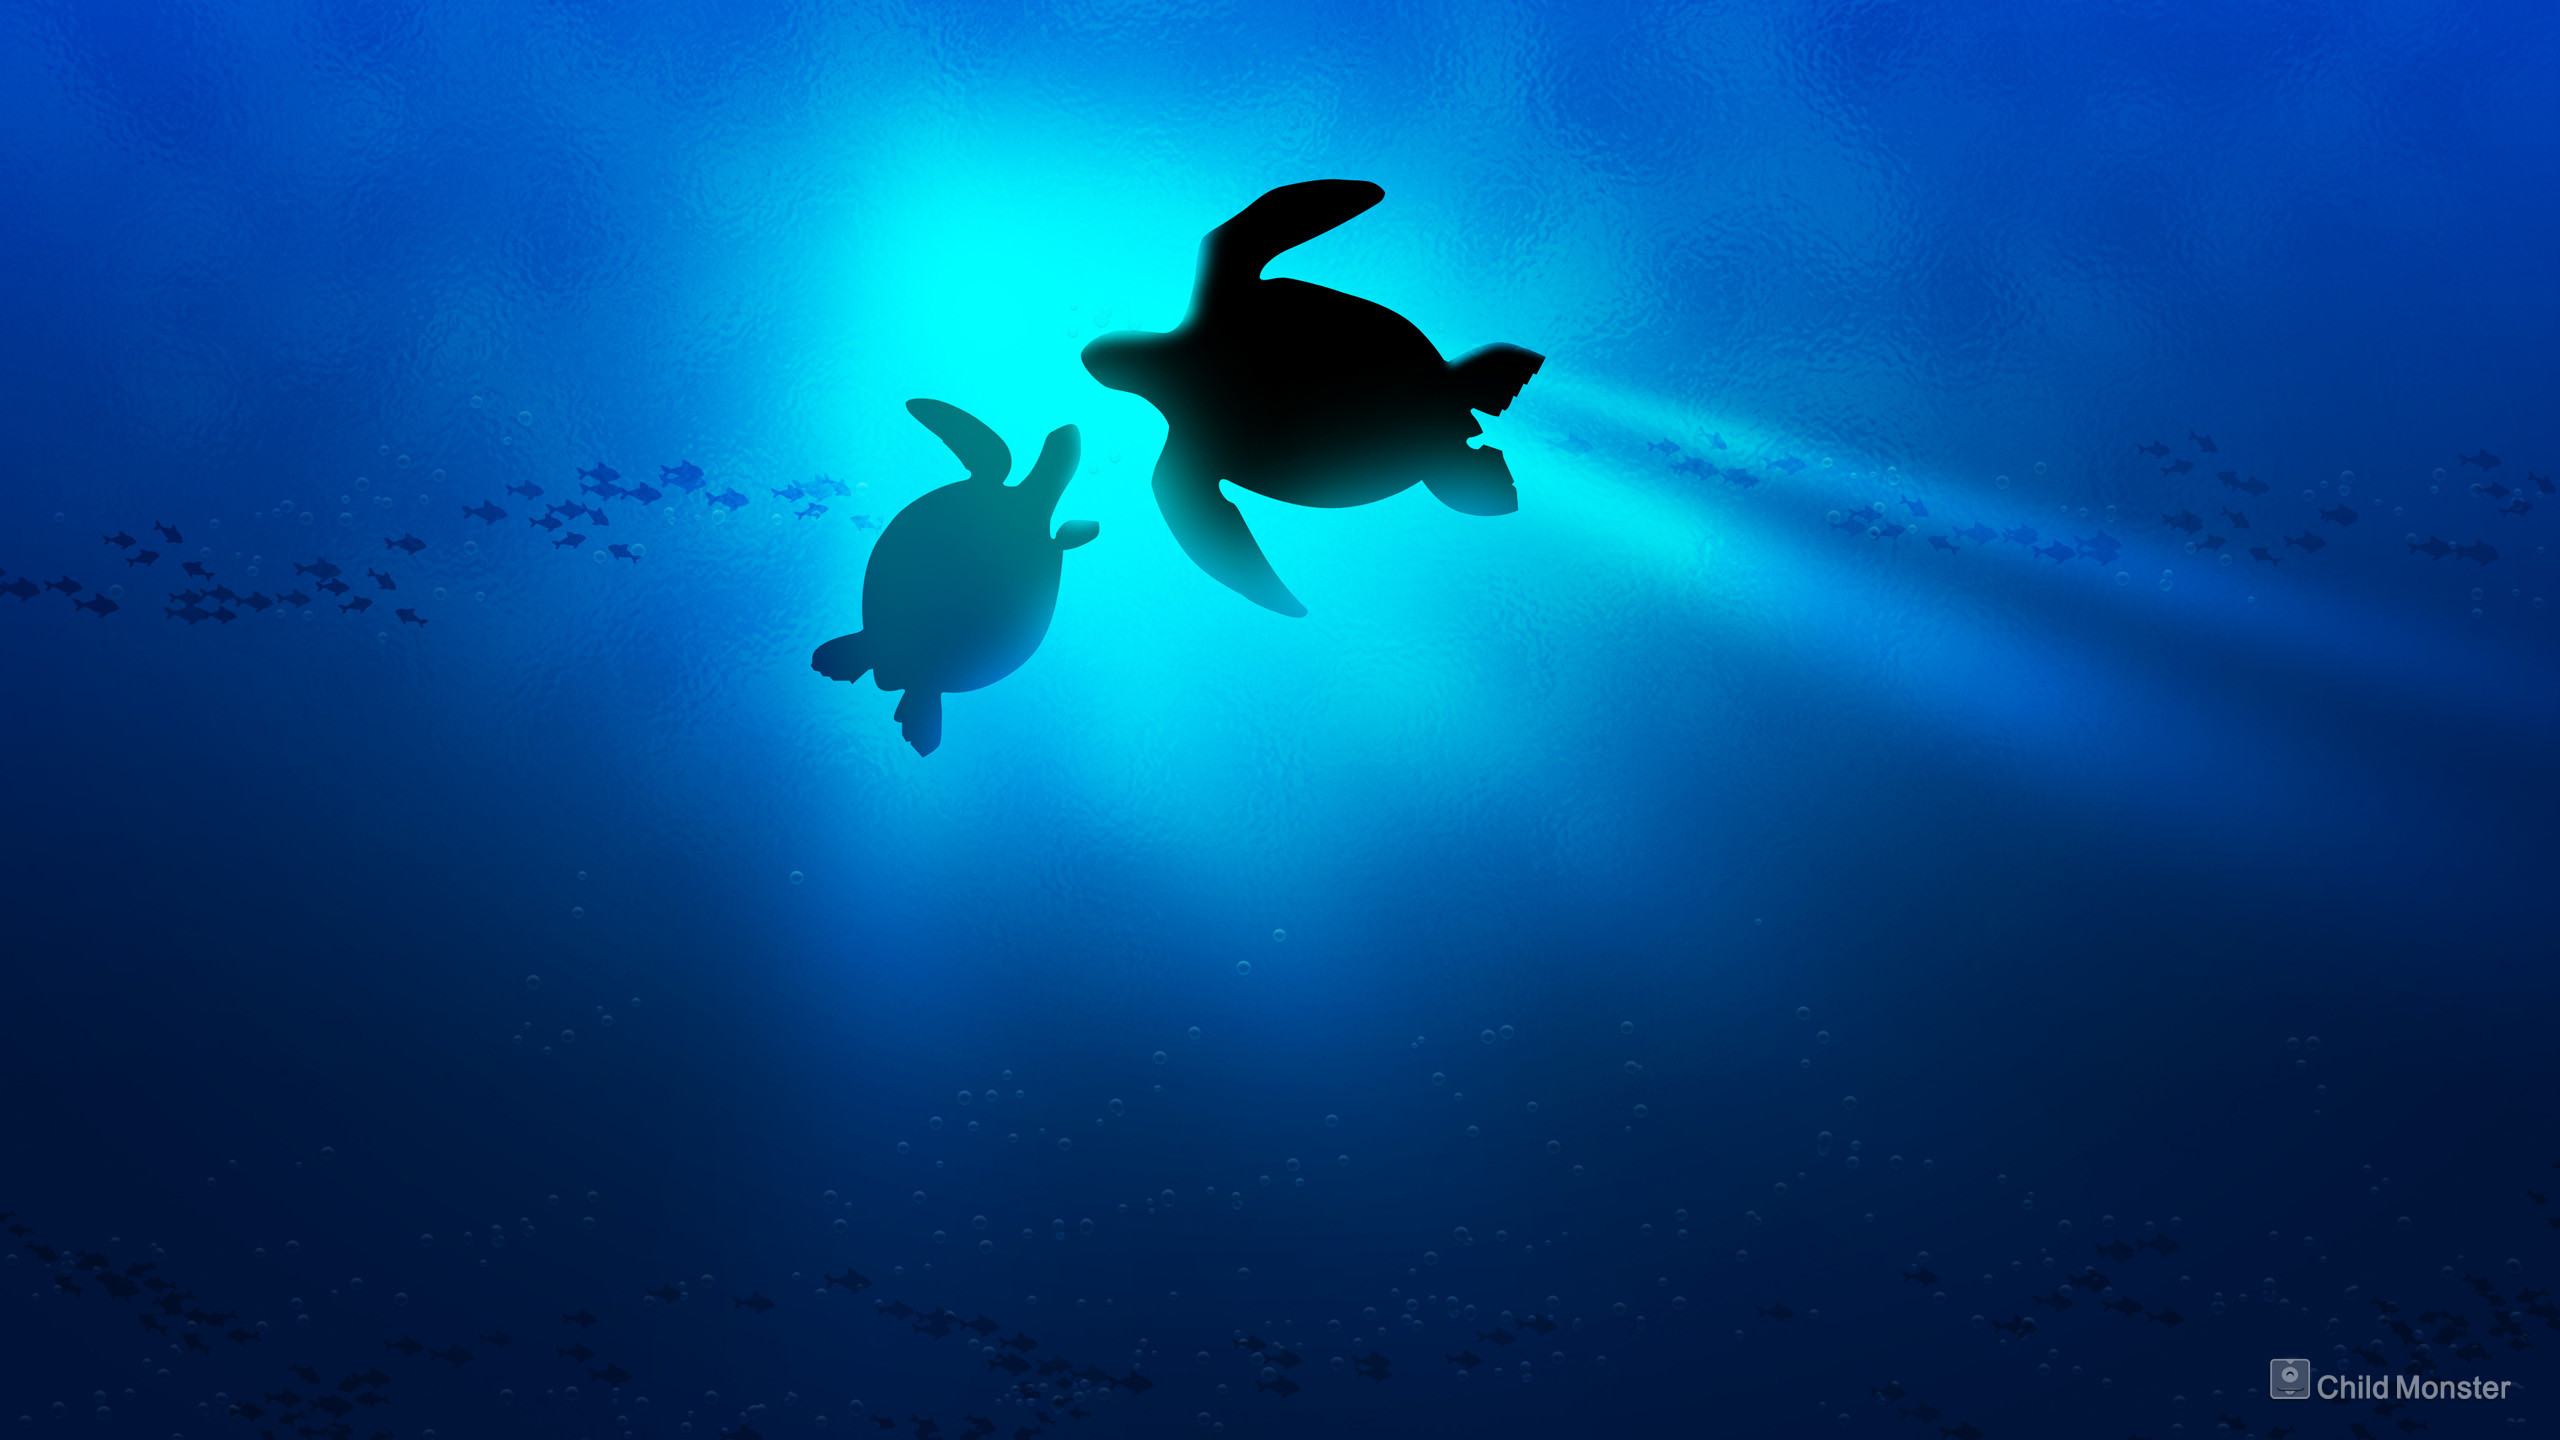 Baby Sea Turtle Wallpaper Desktop Background – Mekamak